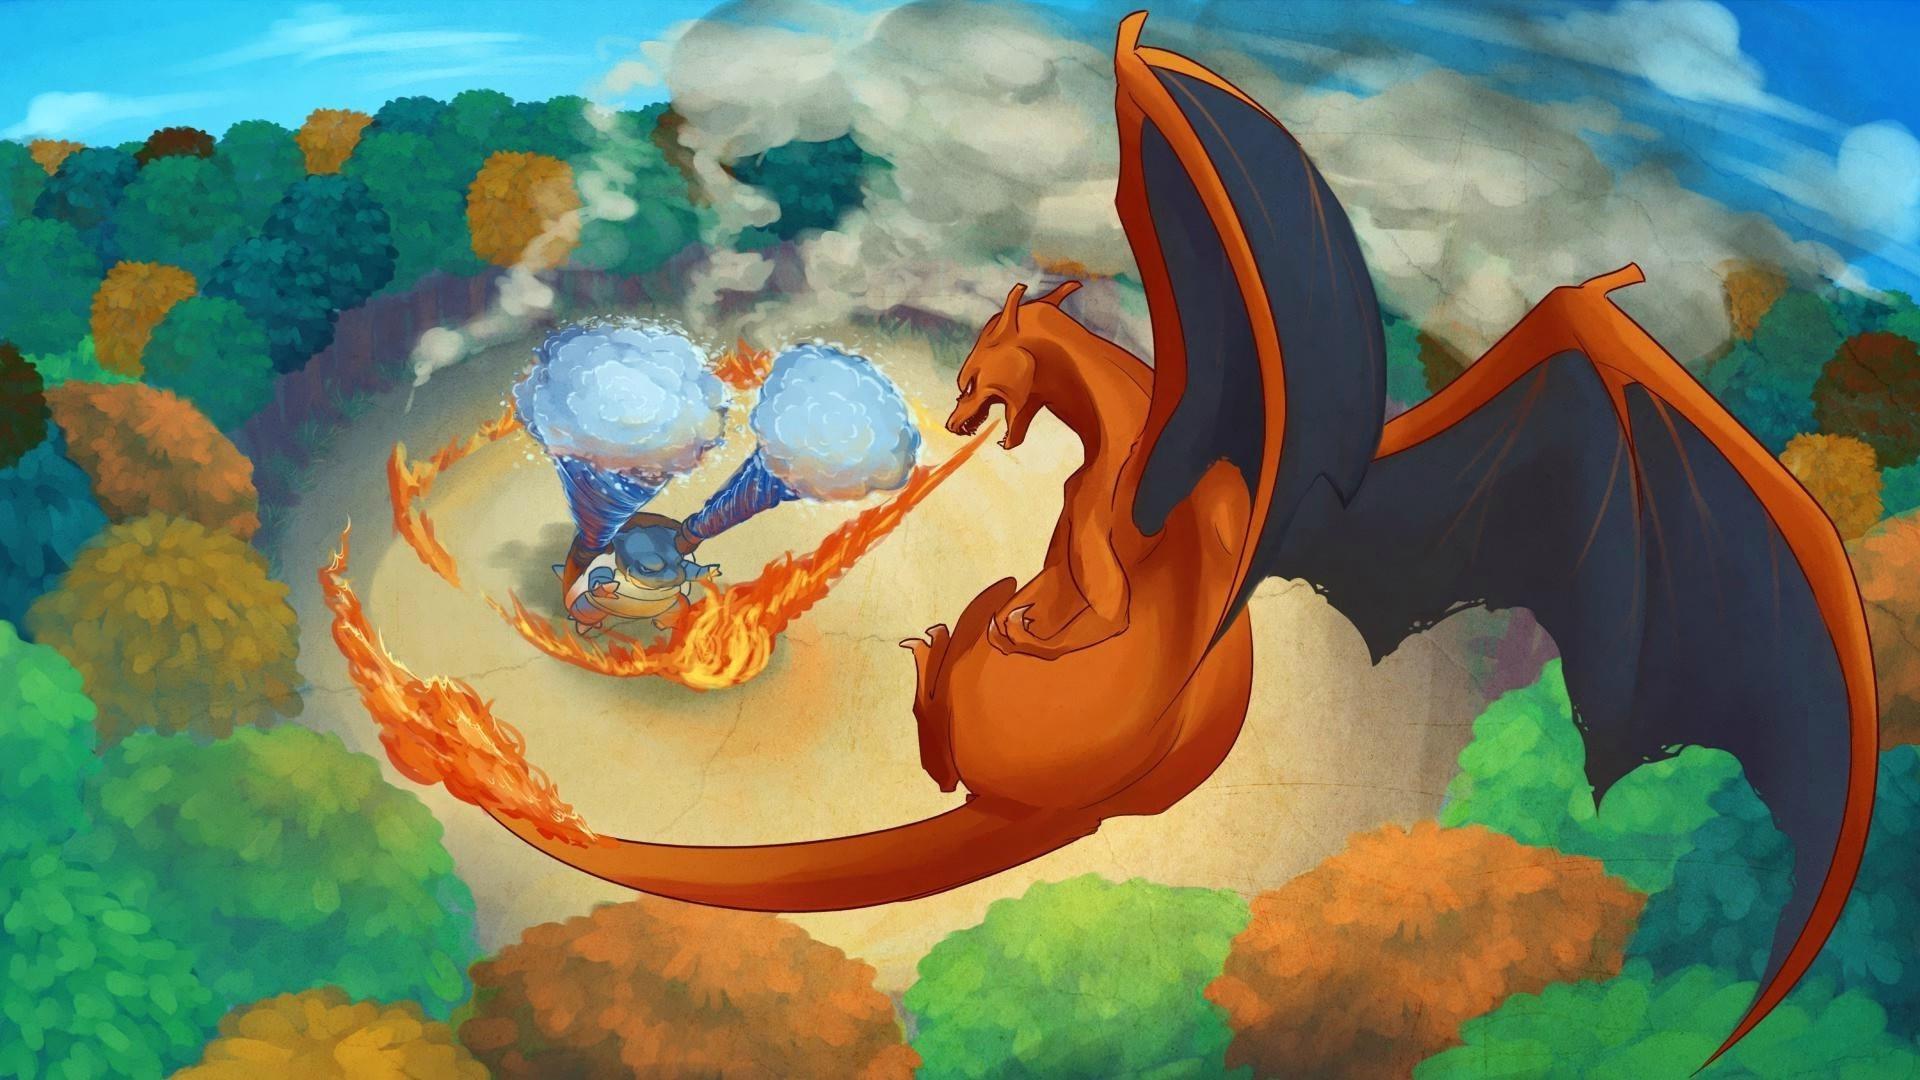 Charizard, Blastoise, Pokémon, Artwork, Fantasy art, Fire, Dragon, Water  Wallpapers HD / Desktop and Mobile Backgrounds